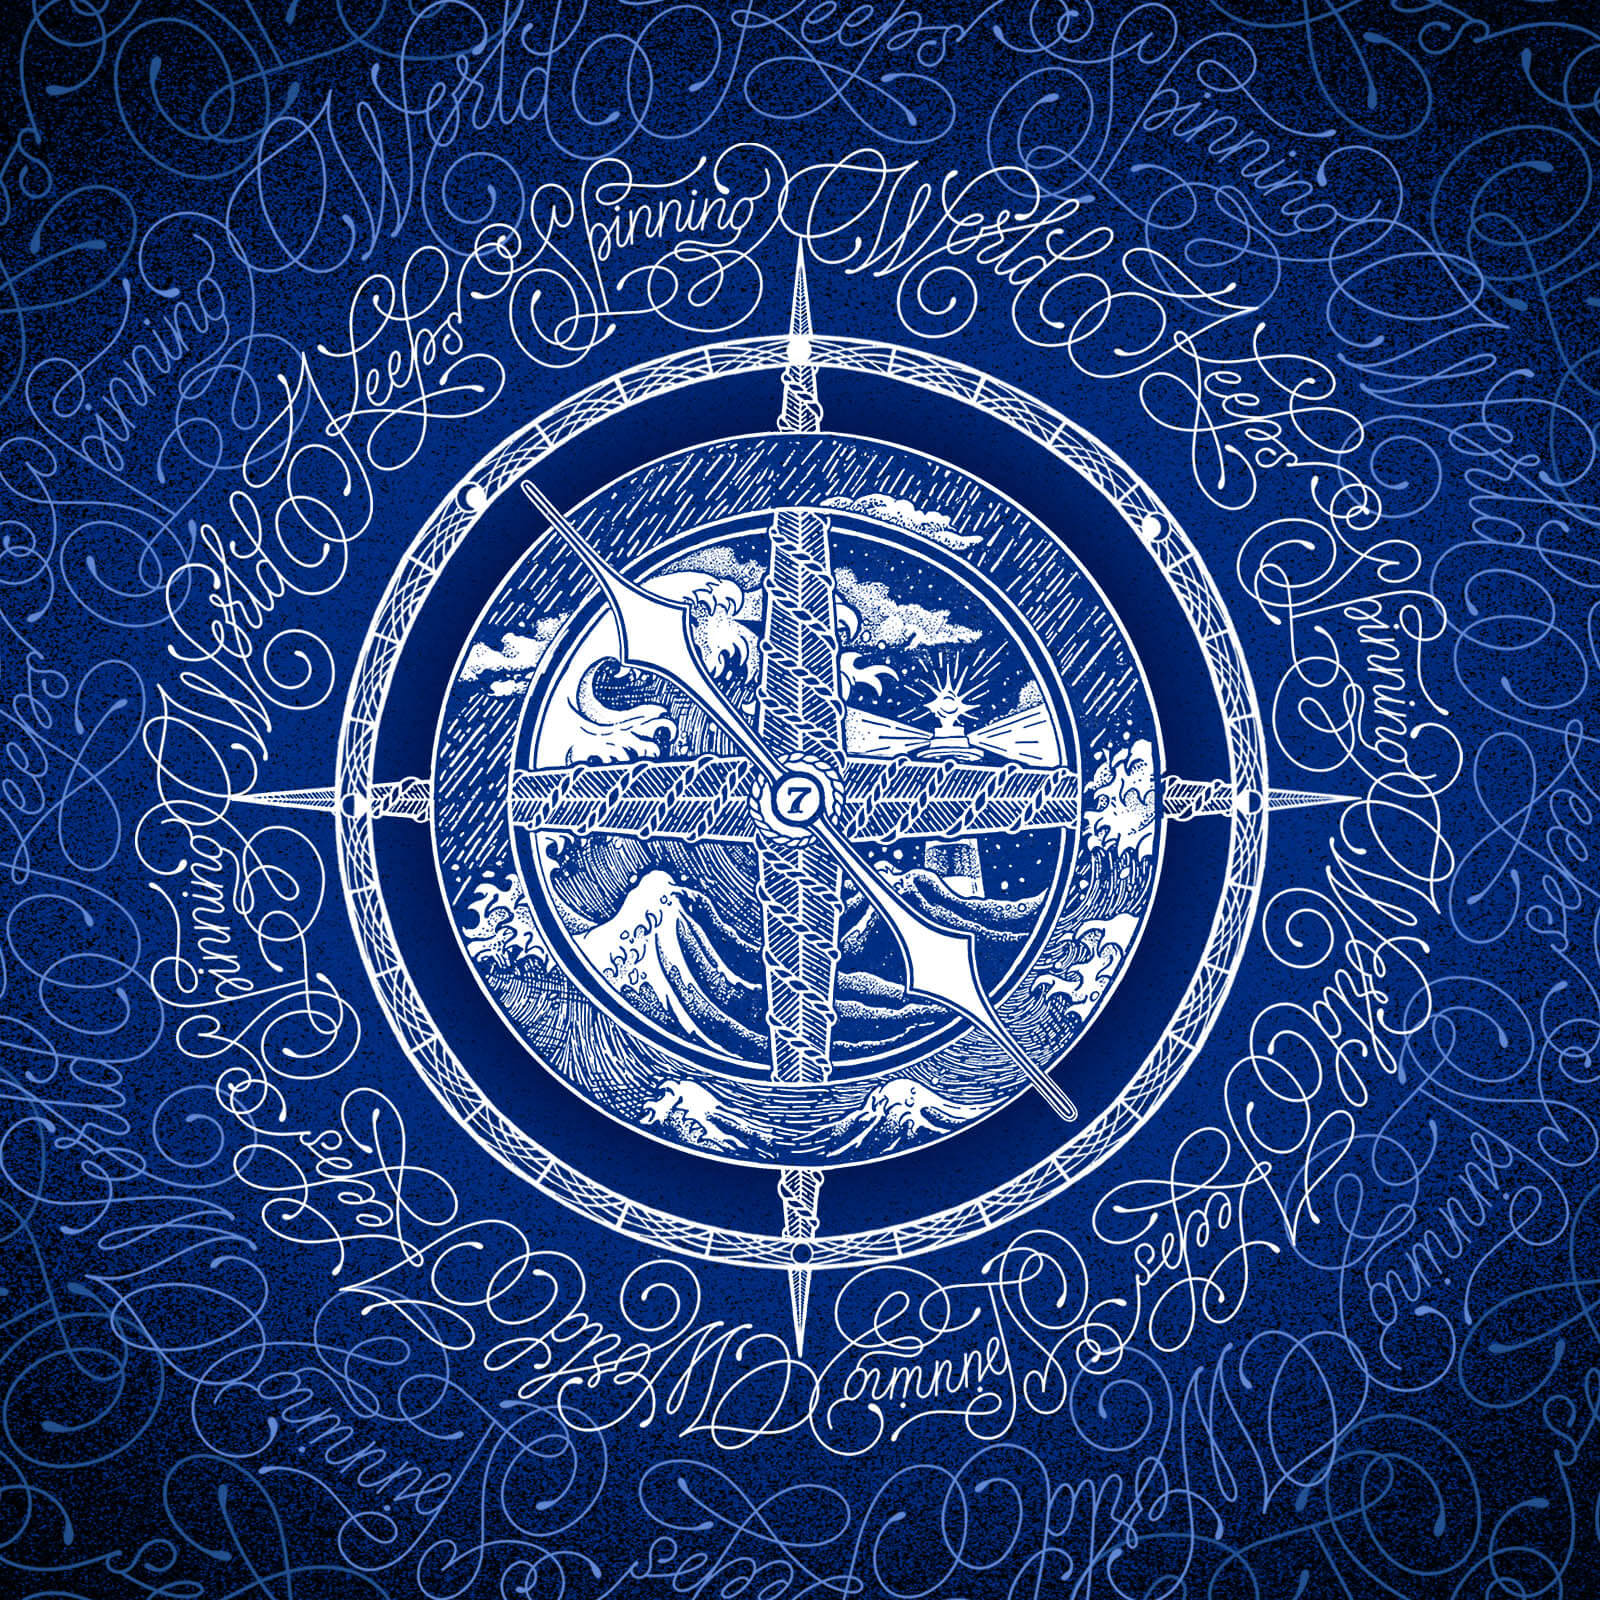 World Keeps Spinning - Tanya Seleznyova